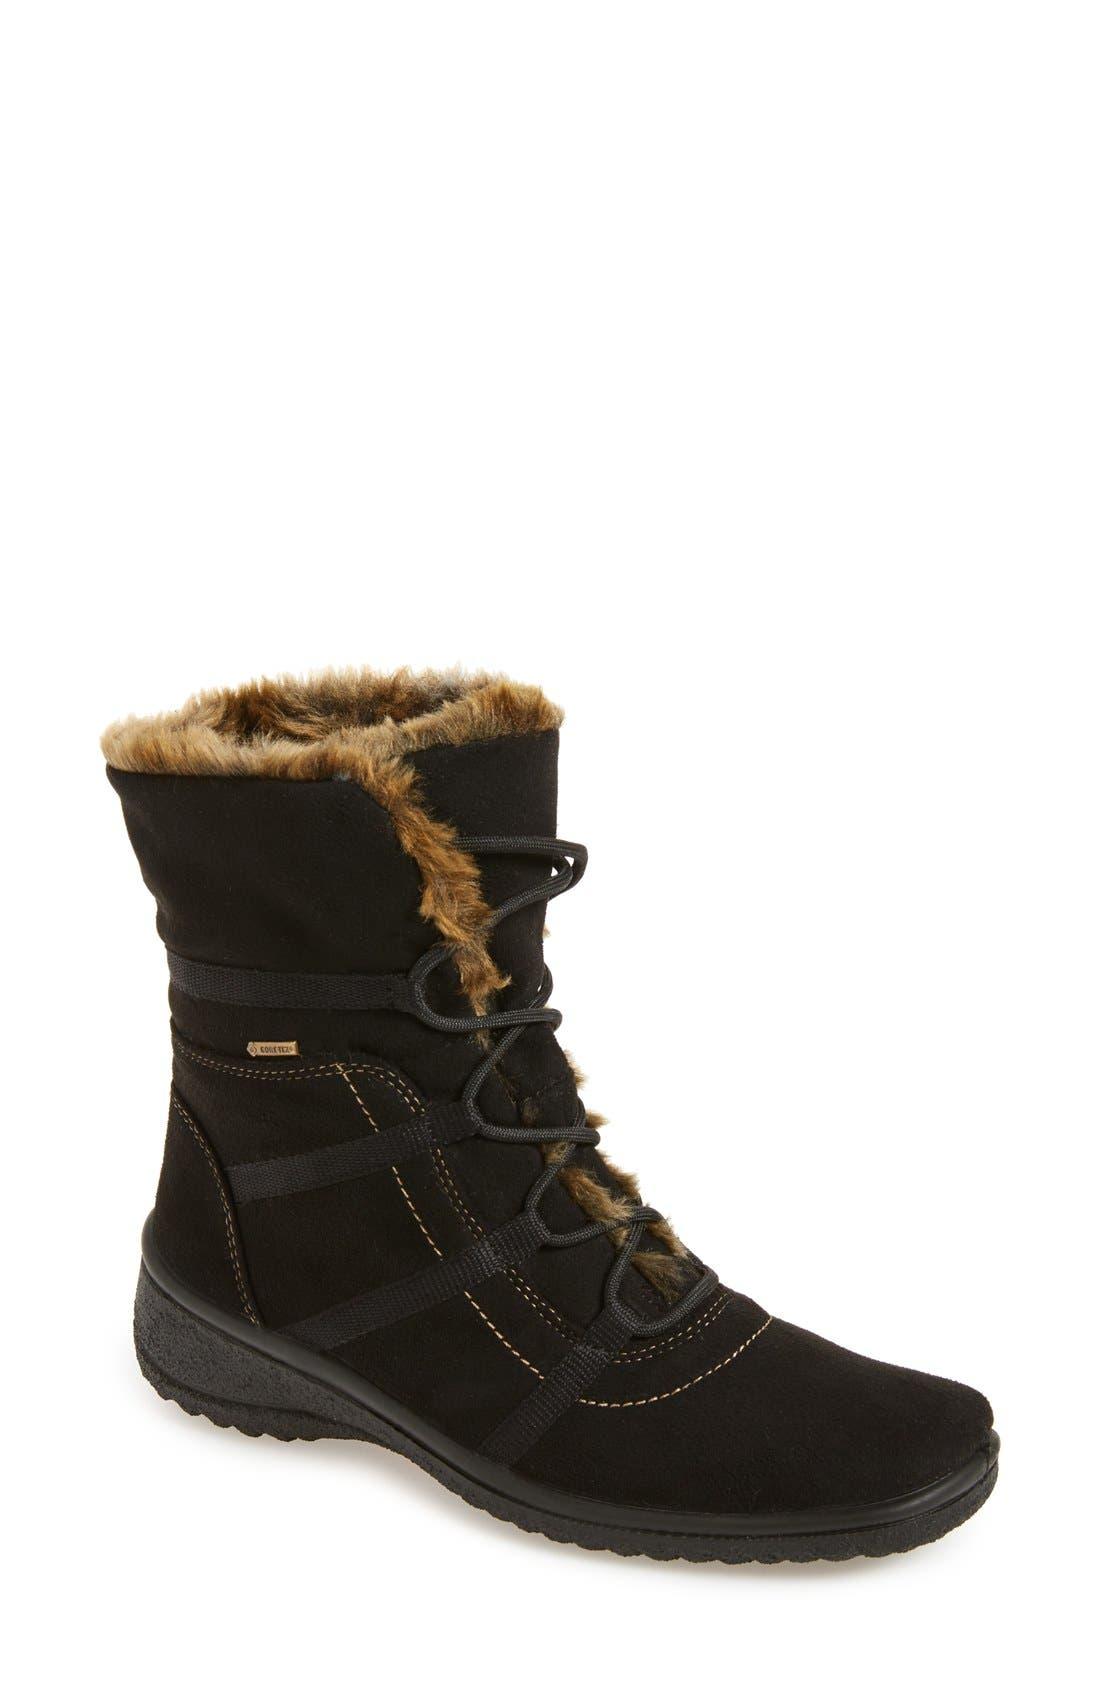 'Magaly' Waterproof Gore-Tex<sup>®</sup> Faux Fur Boot,                             Main thumbnail 1, color,                             BLACK FABRIC